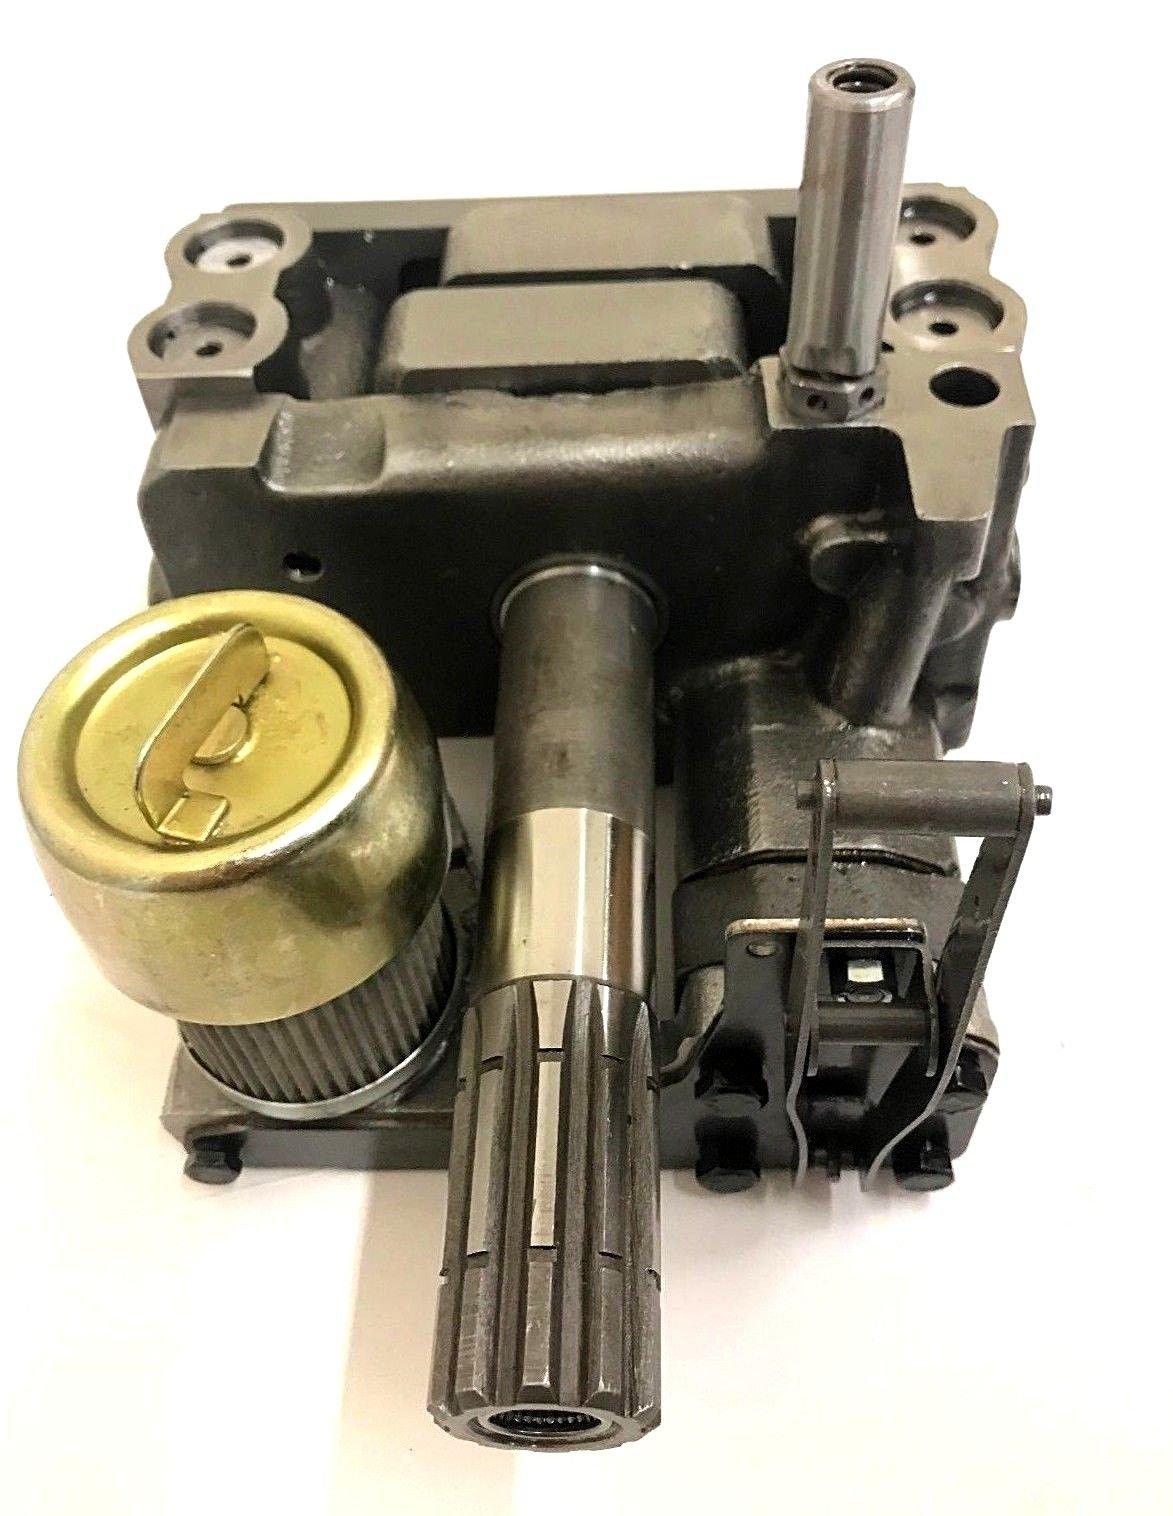 886682M97 New Hydraulic Lift Pump For MF 40 135 165 30 20 175 150 180 3165 1684582M92 1869615M91 886331M92 886683M92 886684M97 519343M93 1684582T